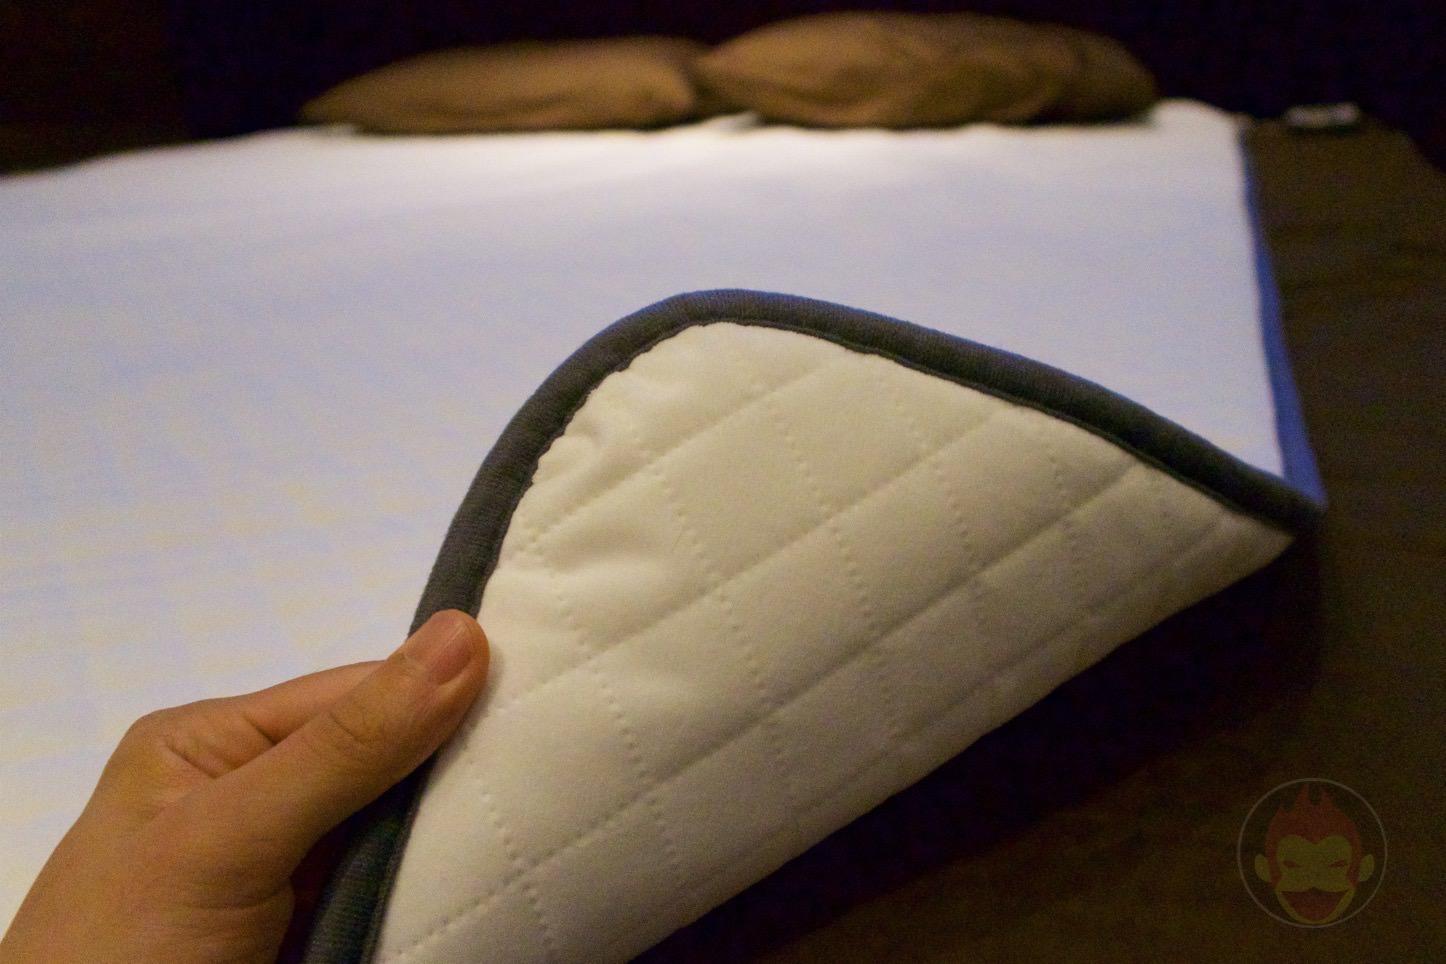 Mooring-by-mirahome-iot-mattress-07.jpg